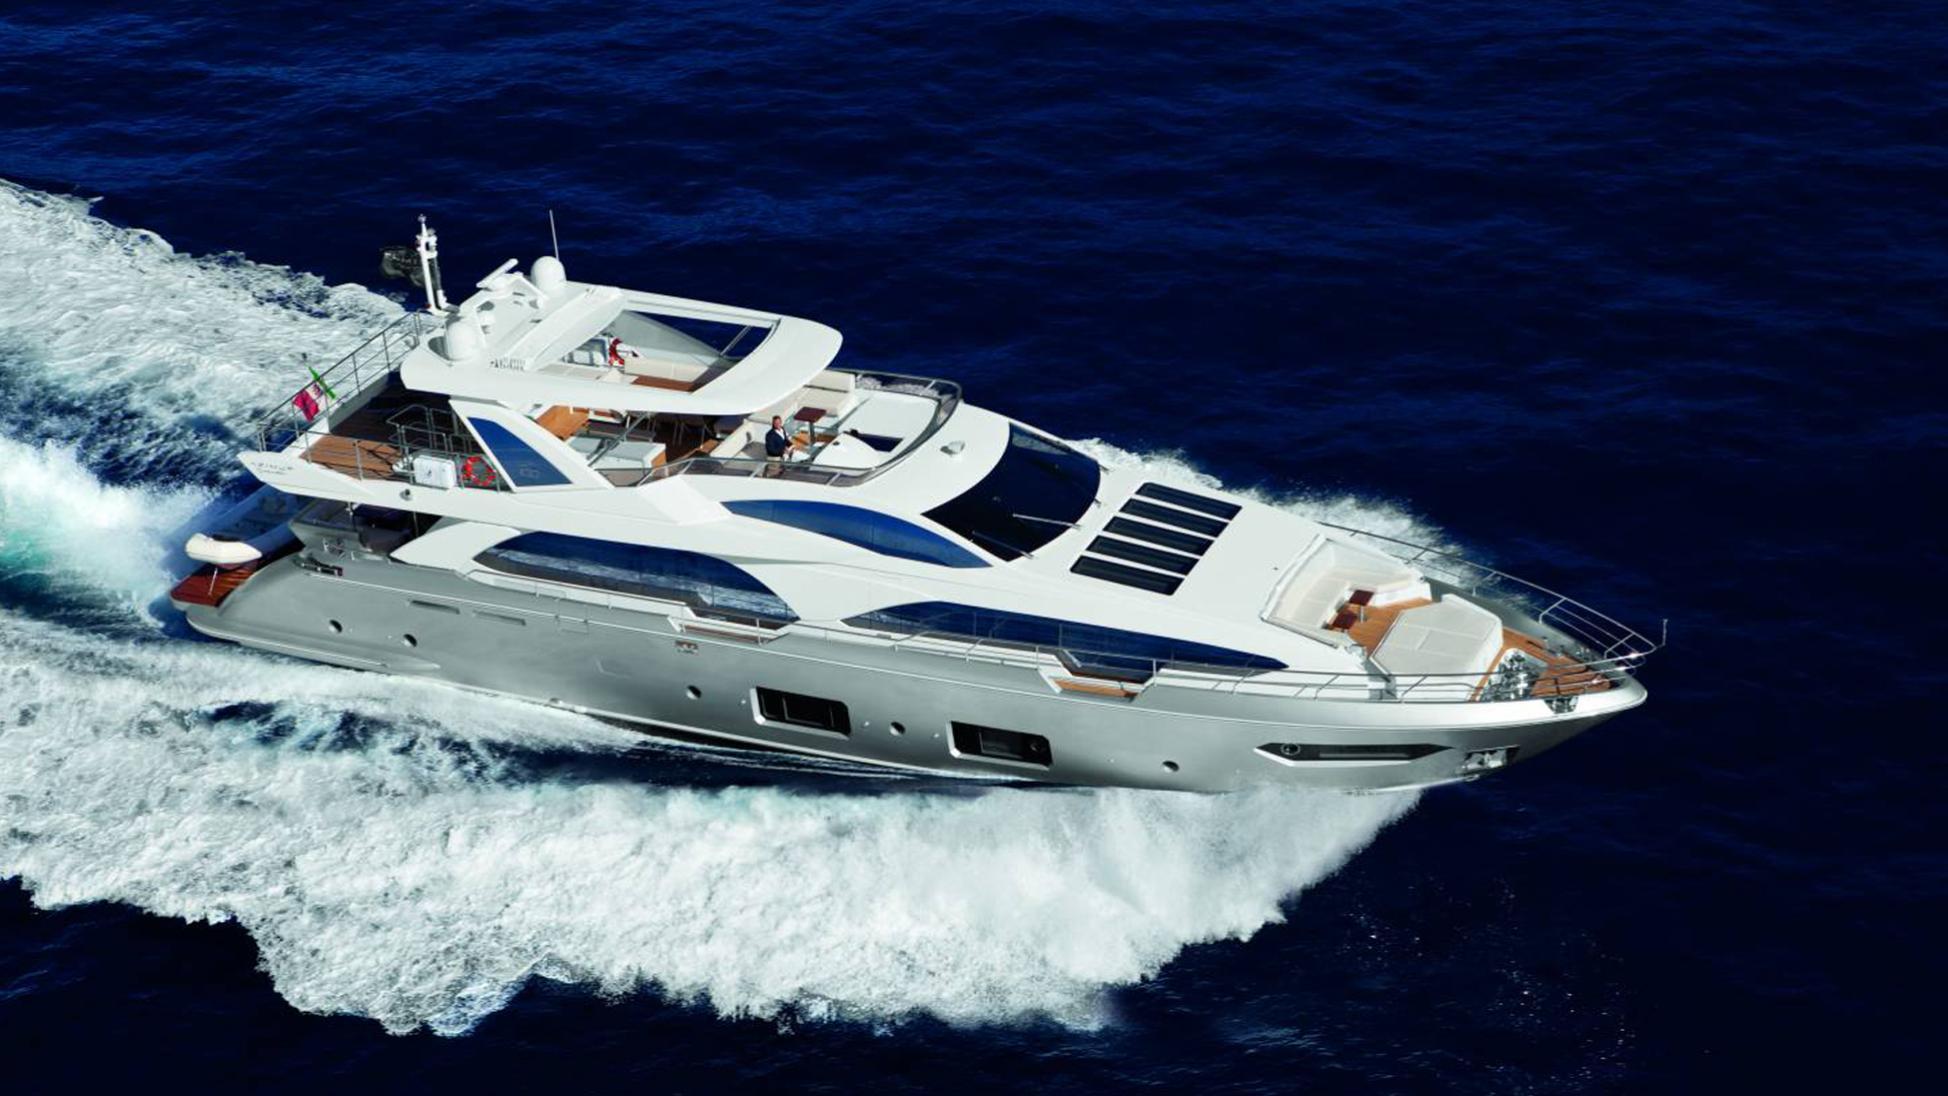 azimut-100-18-grande-motor-yacht-2016-31m-aerial